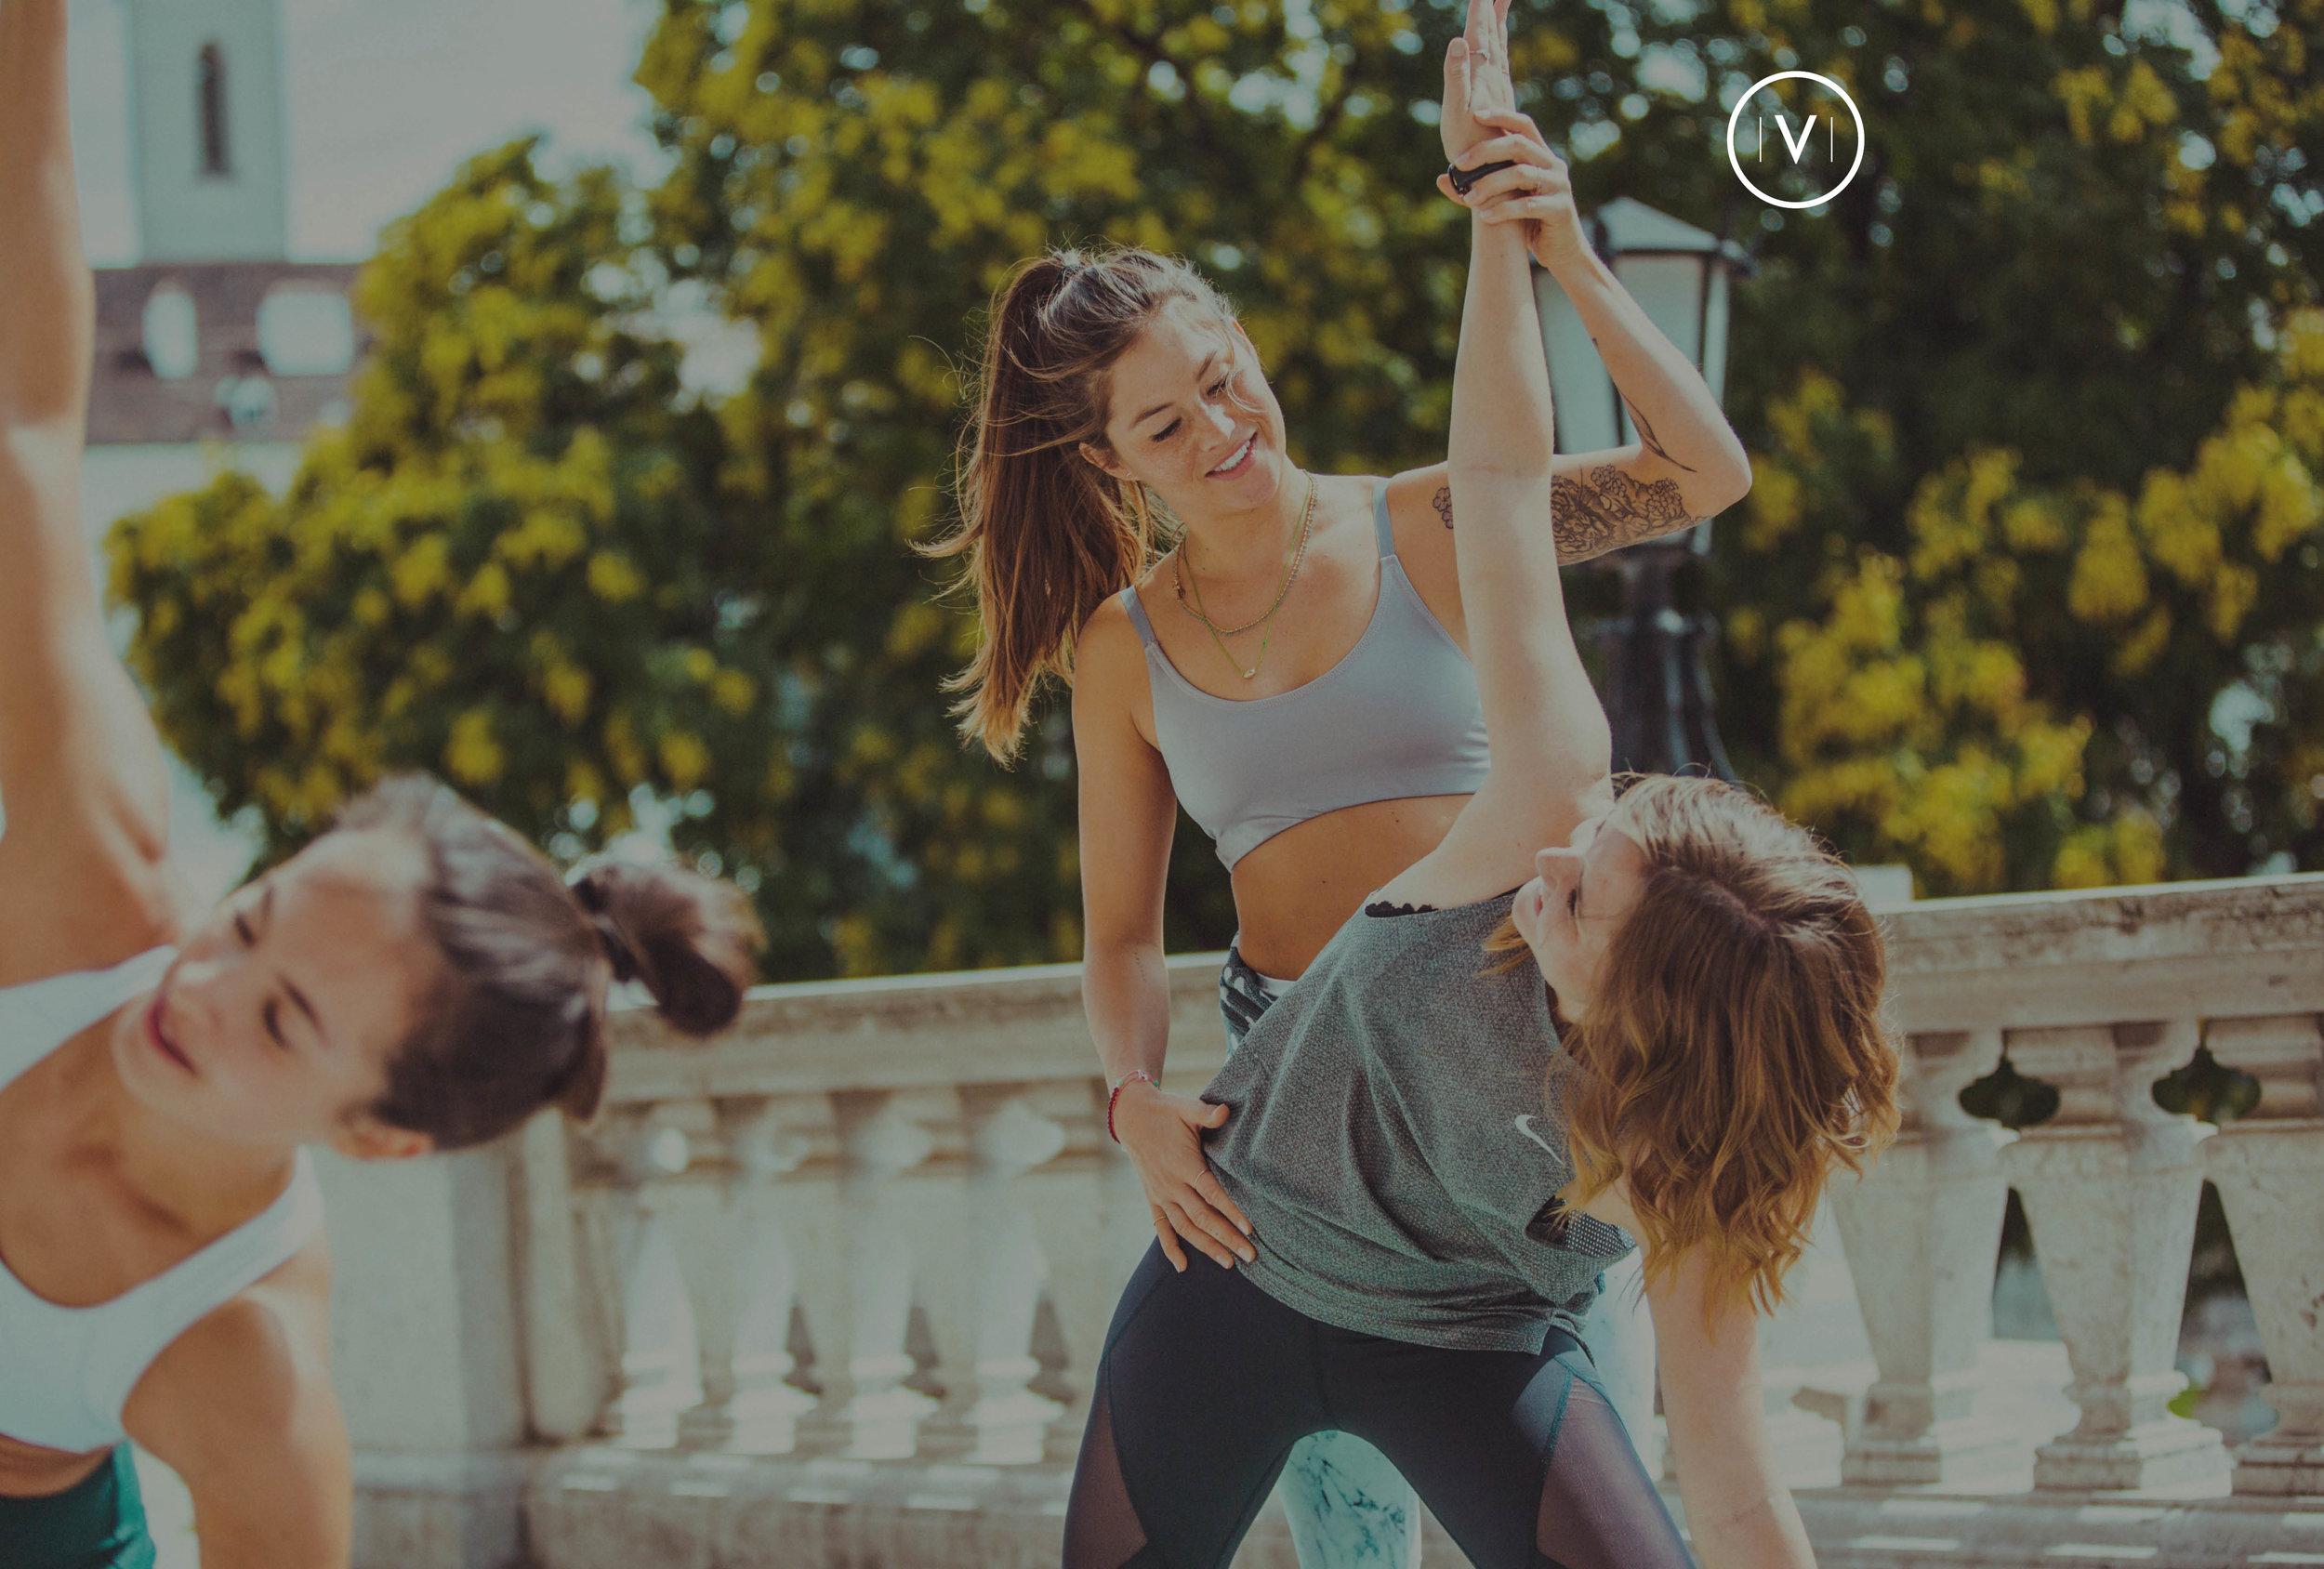 Verenas Mindful Health Verena Hoflehner Yoga Detox Body KD16.jpg